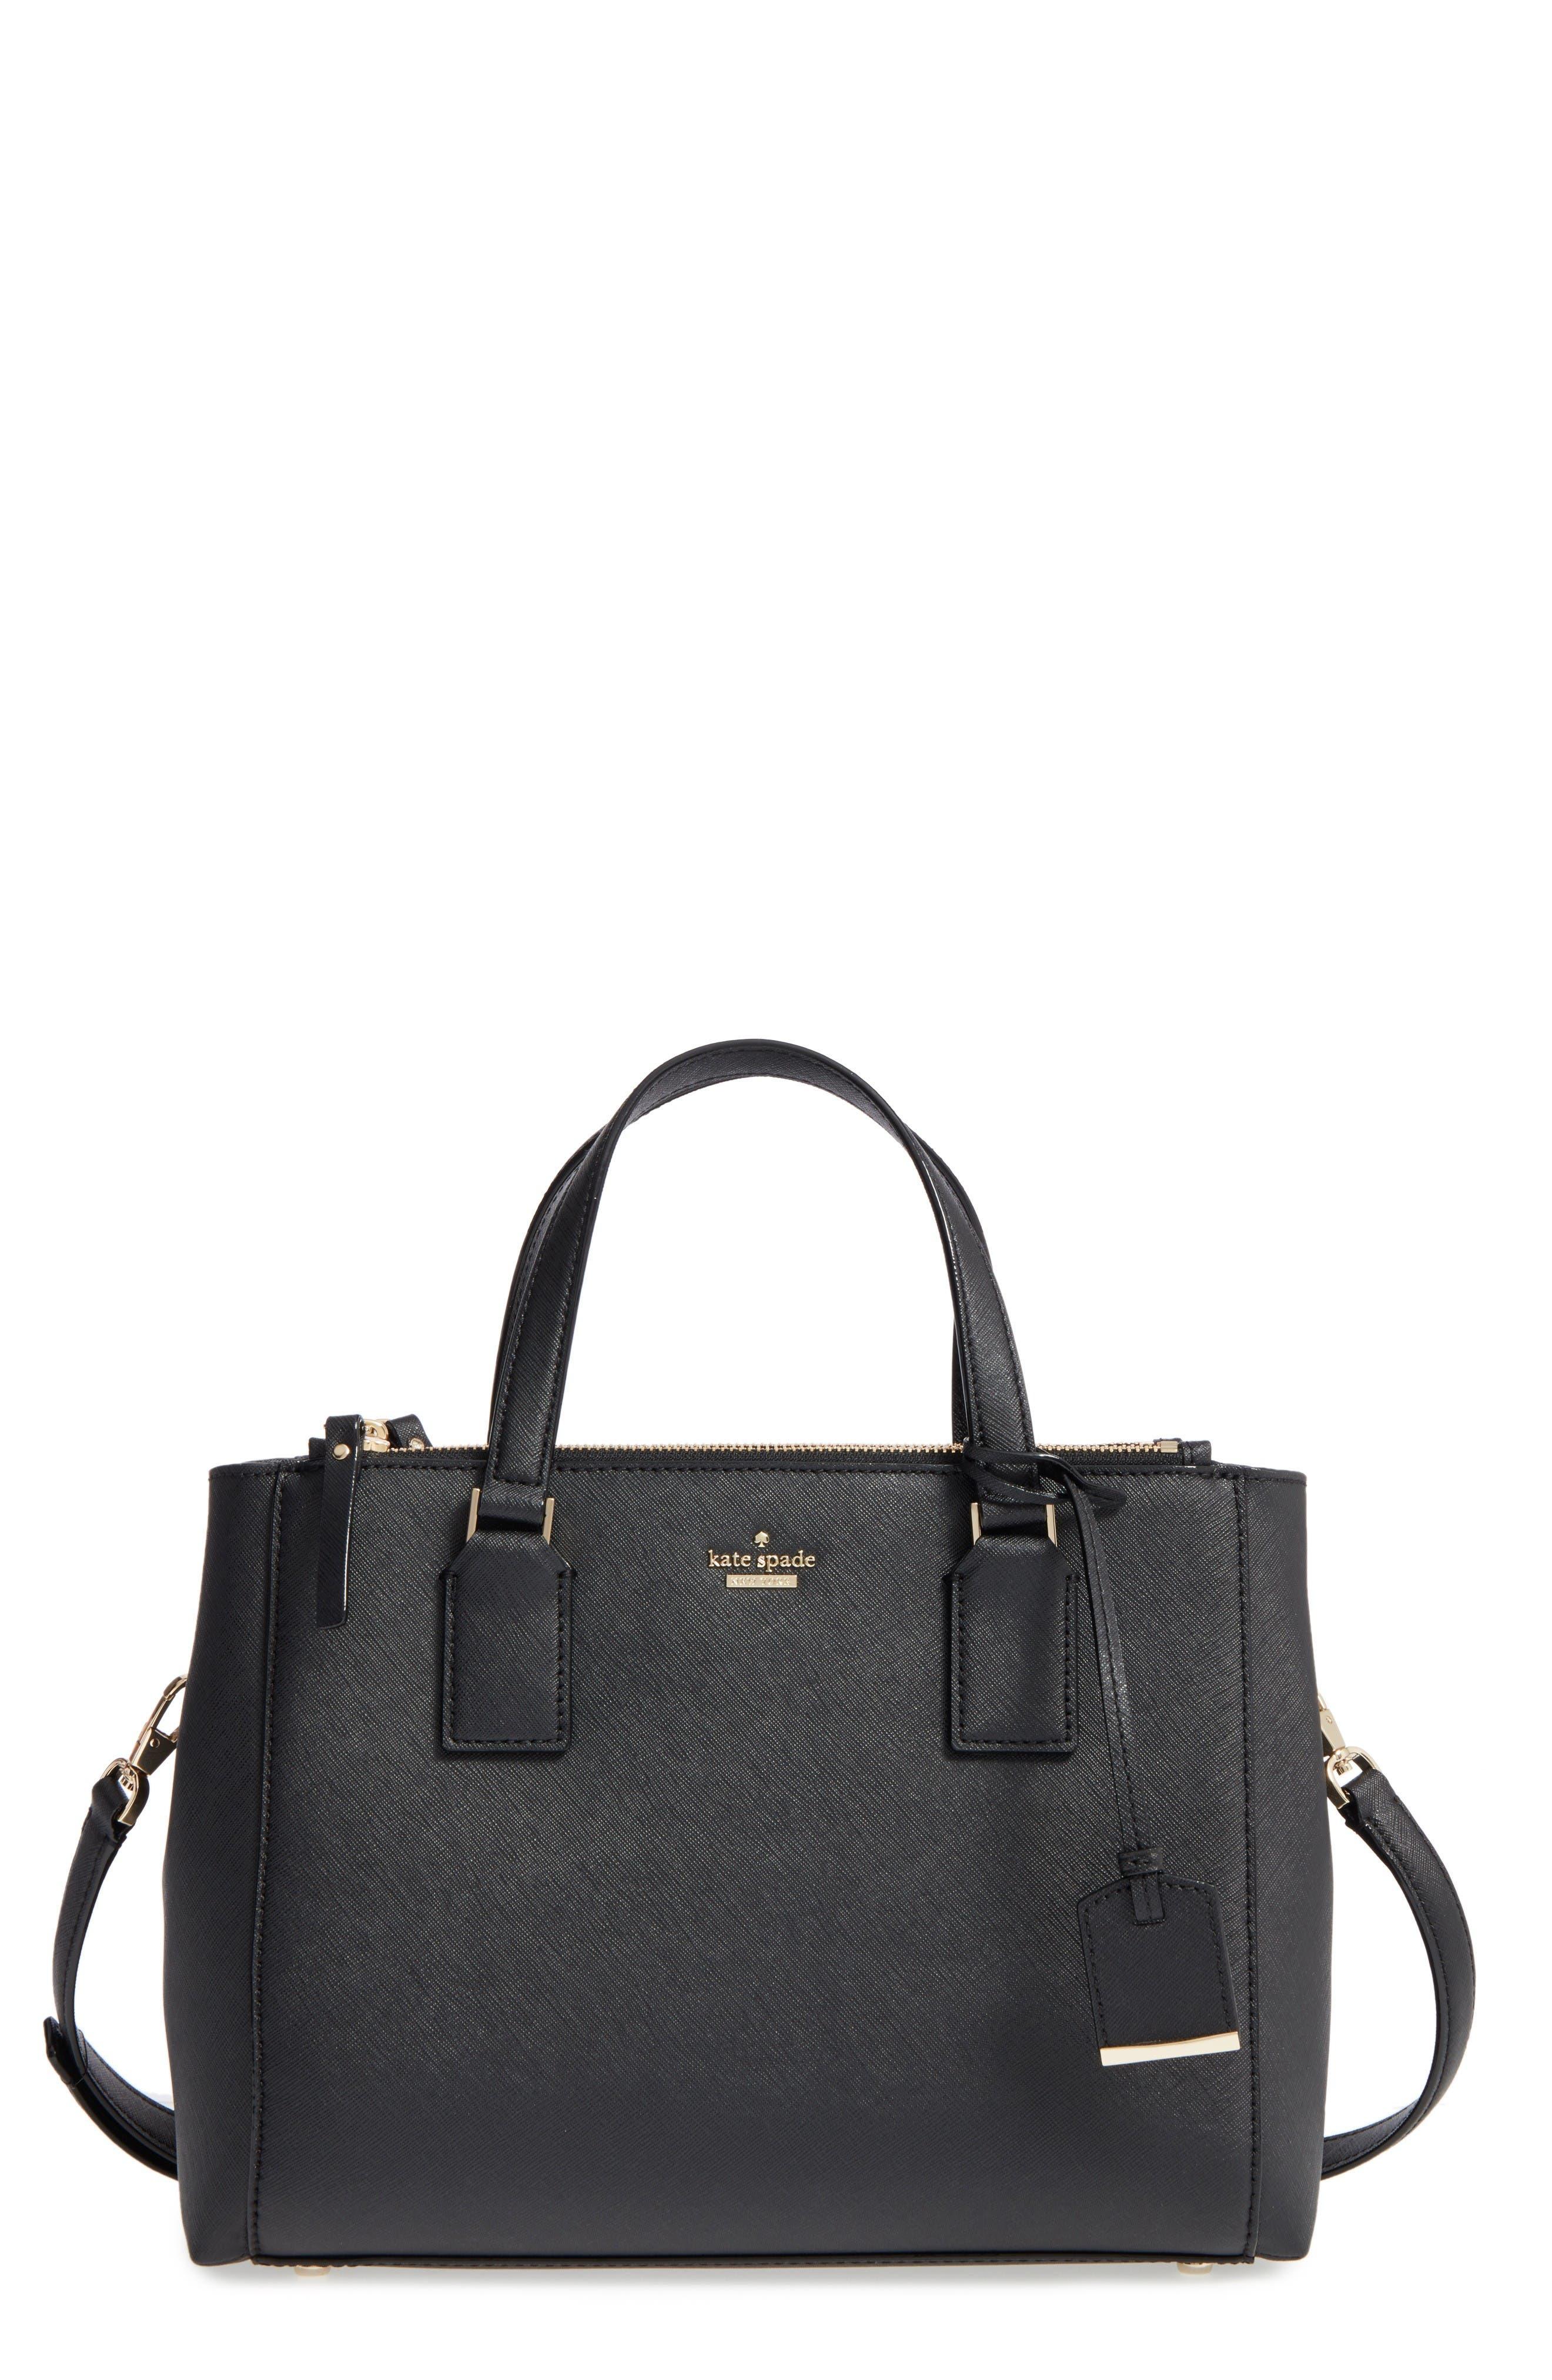 cameron street - teegan calfskin leather satchel,                             Main thumbnail 1, color,                             Black